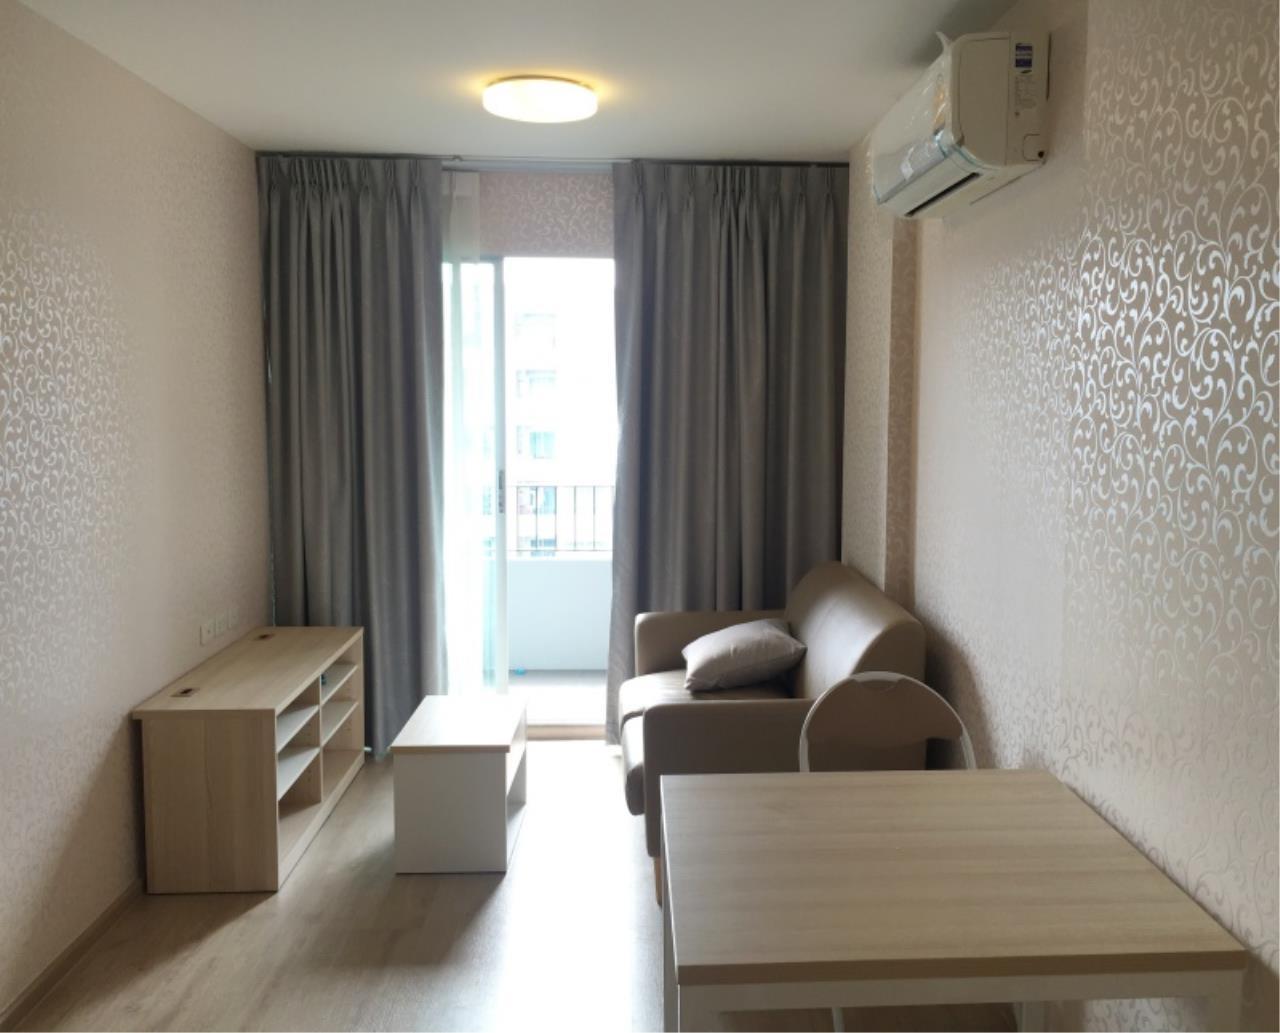 Century21 Skylux Agency's Elio Del Ray / Condo For Sale / 1 Bedroom / 34.5 SQM / BTS Punnawithi / Bangkok 2